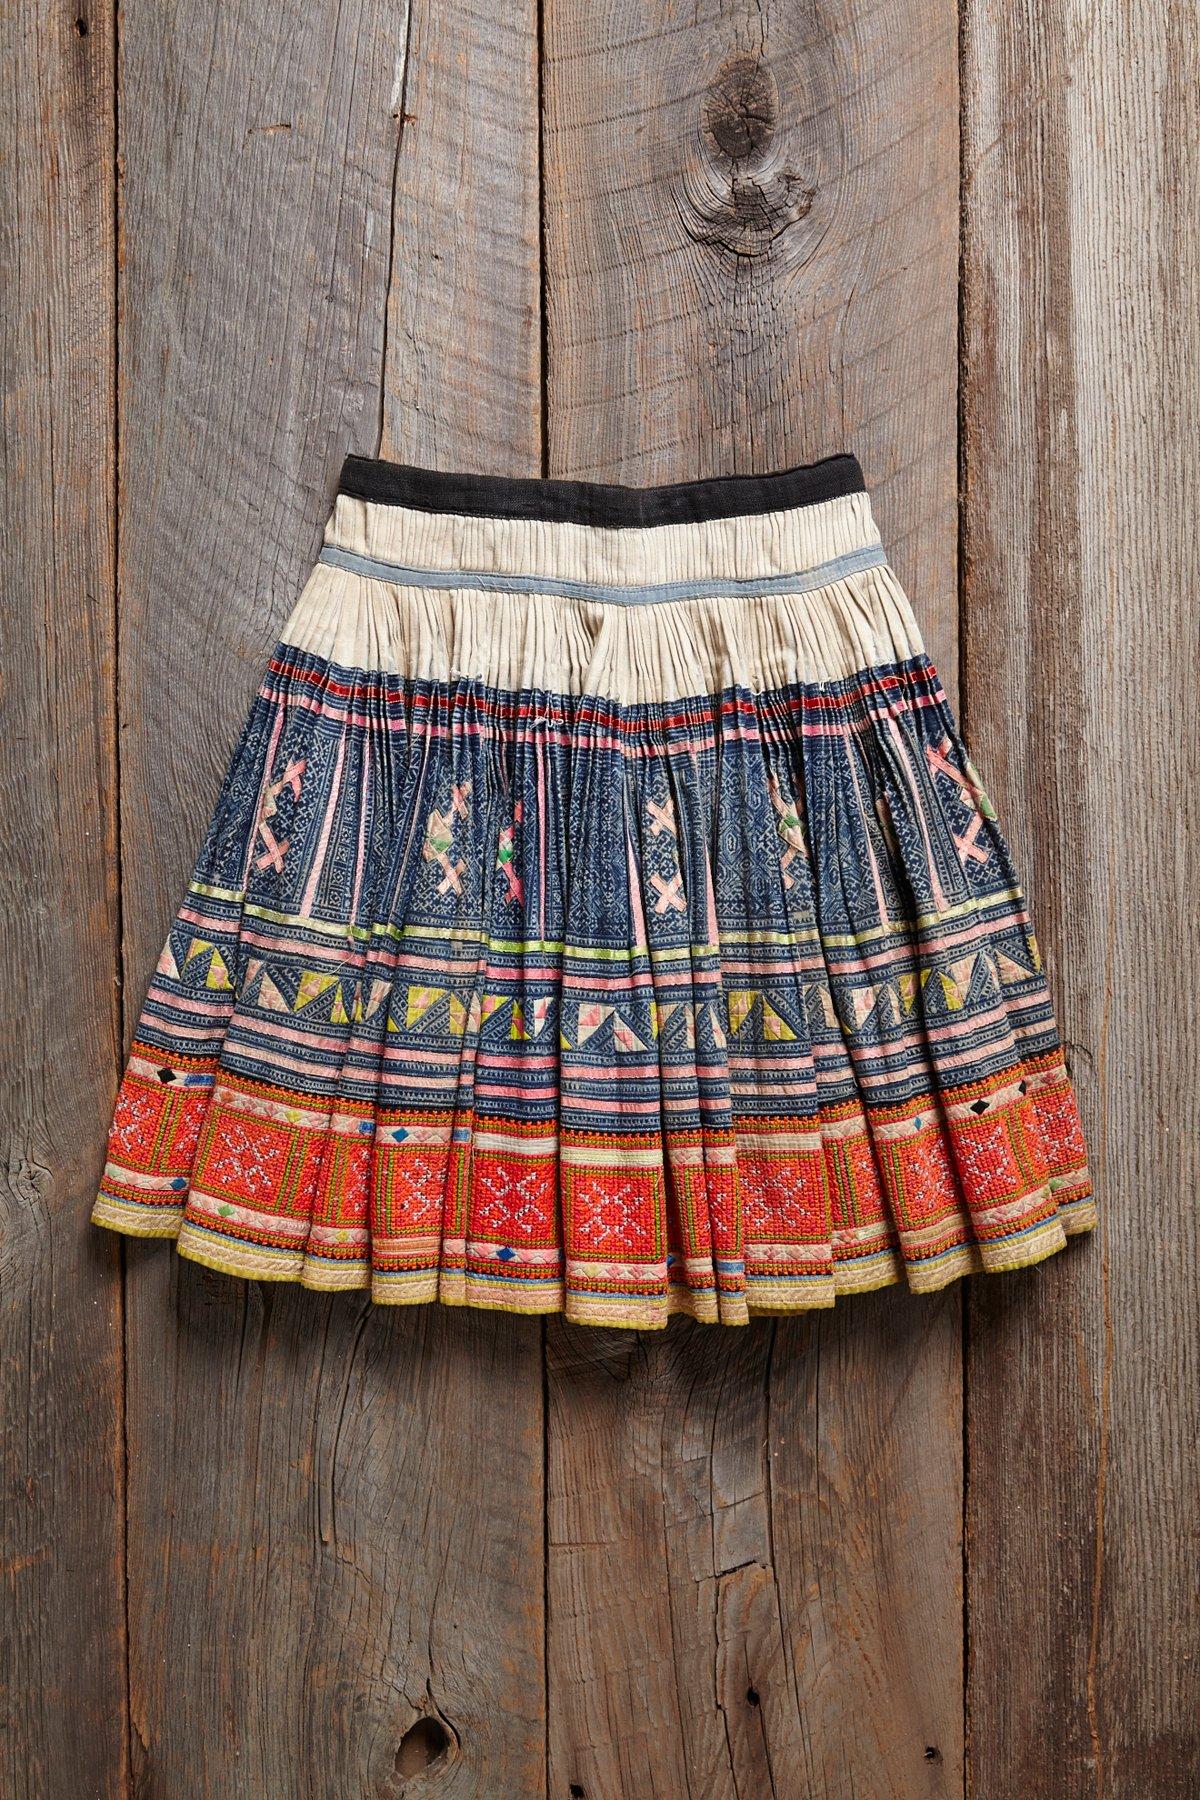 Vintage Embroidered Skirt